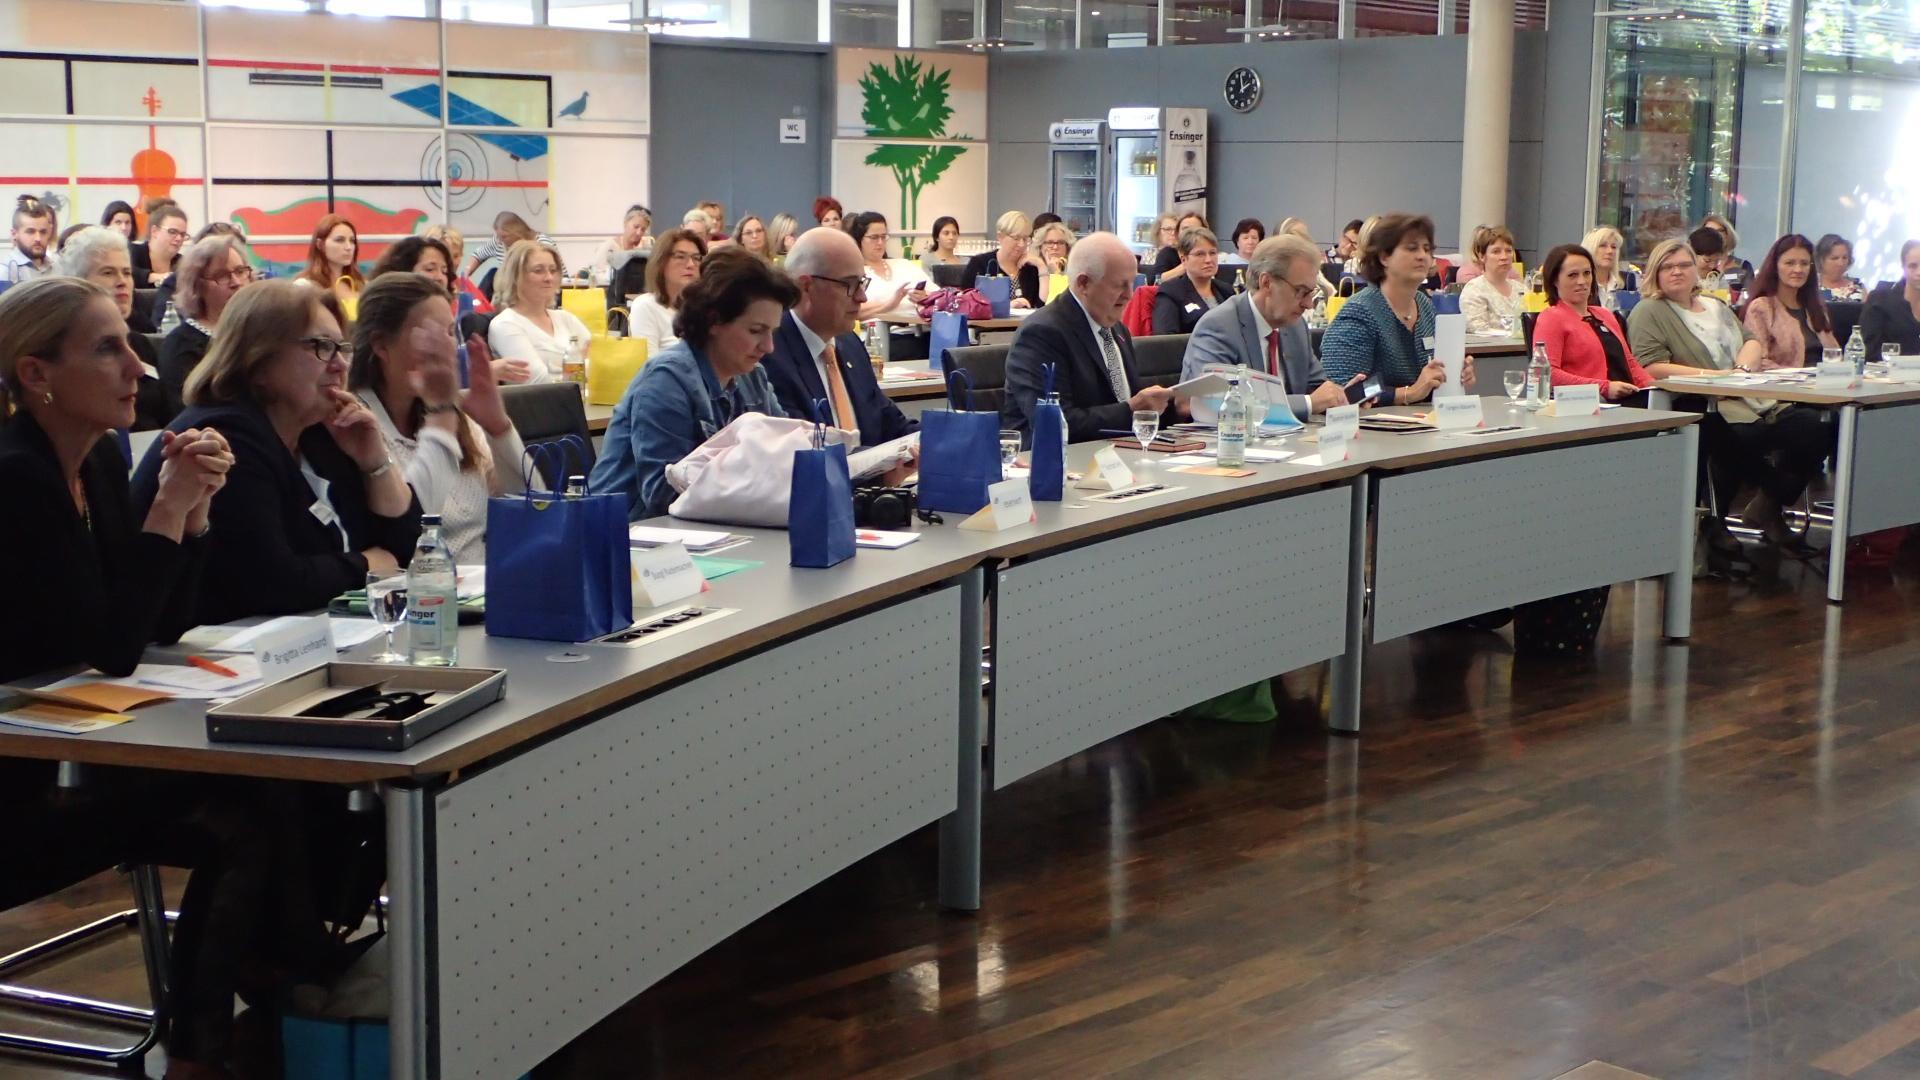 09-18 voll besetzter Sitzungssaal im Landratsamt